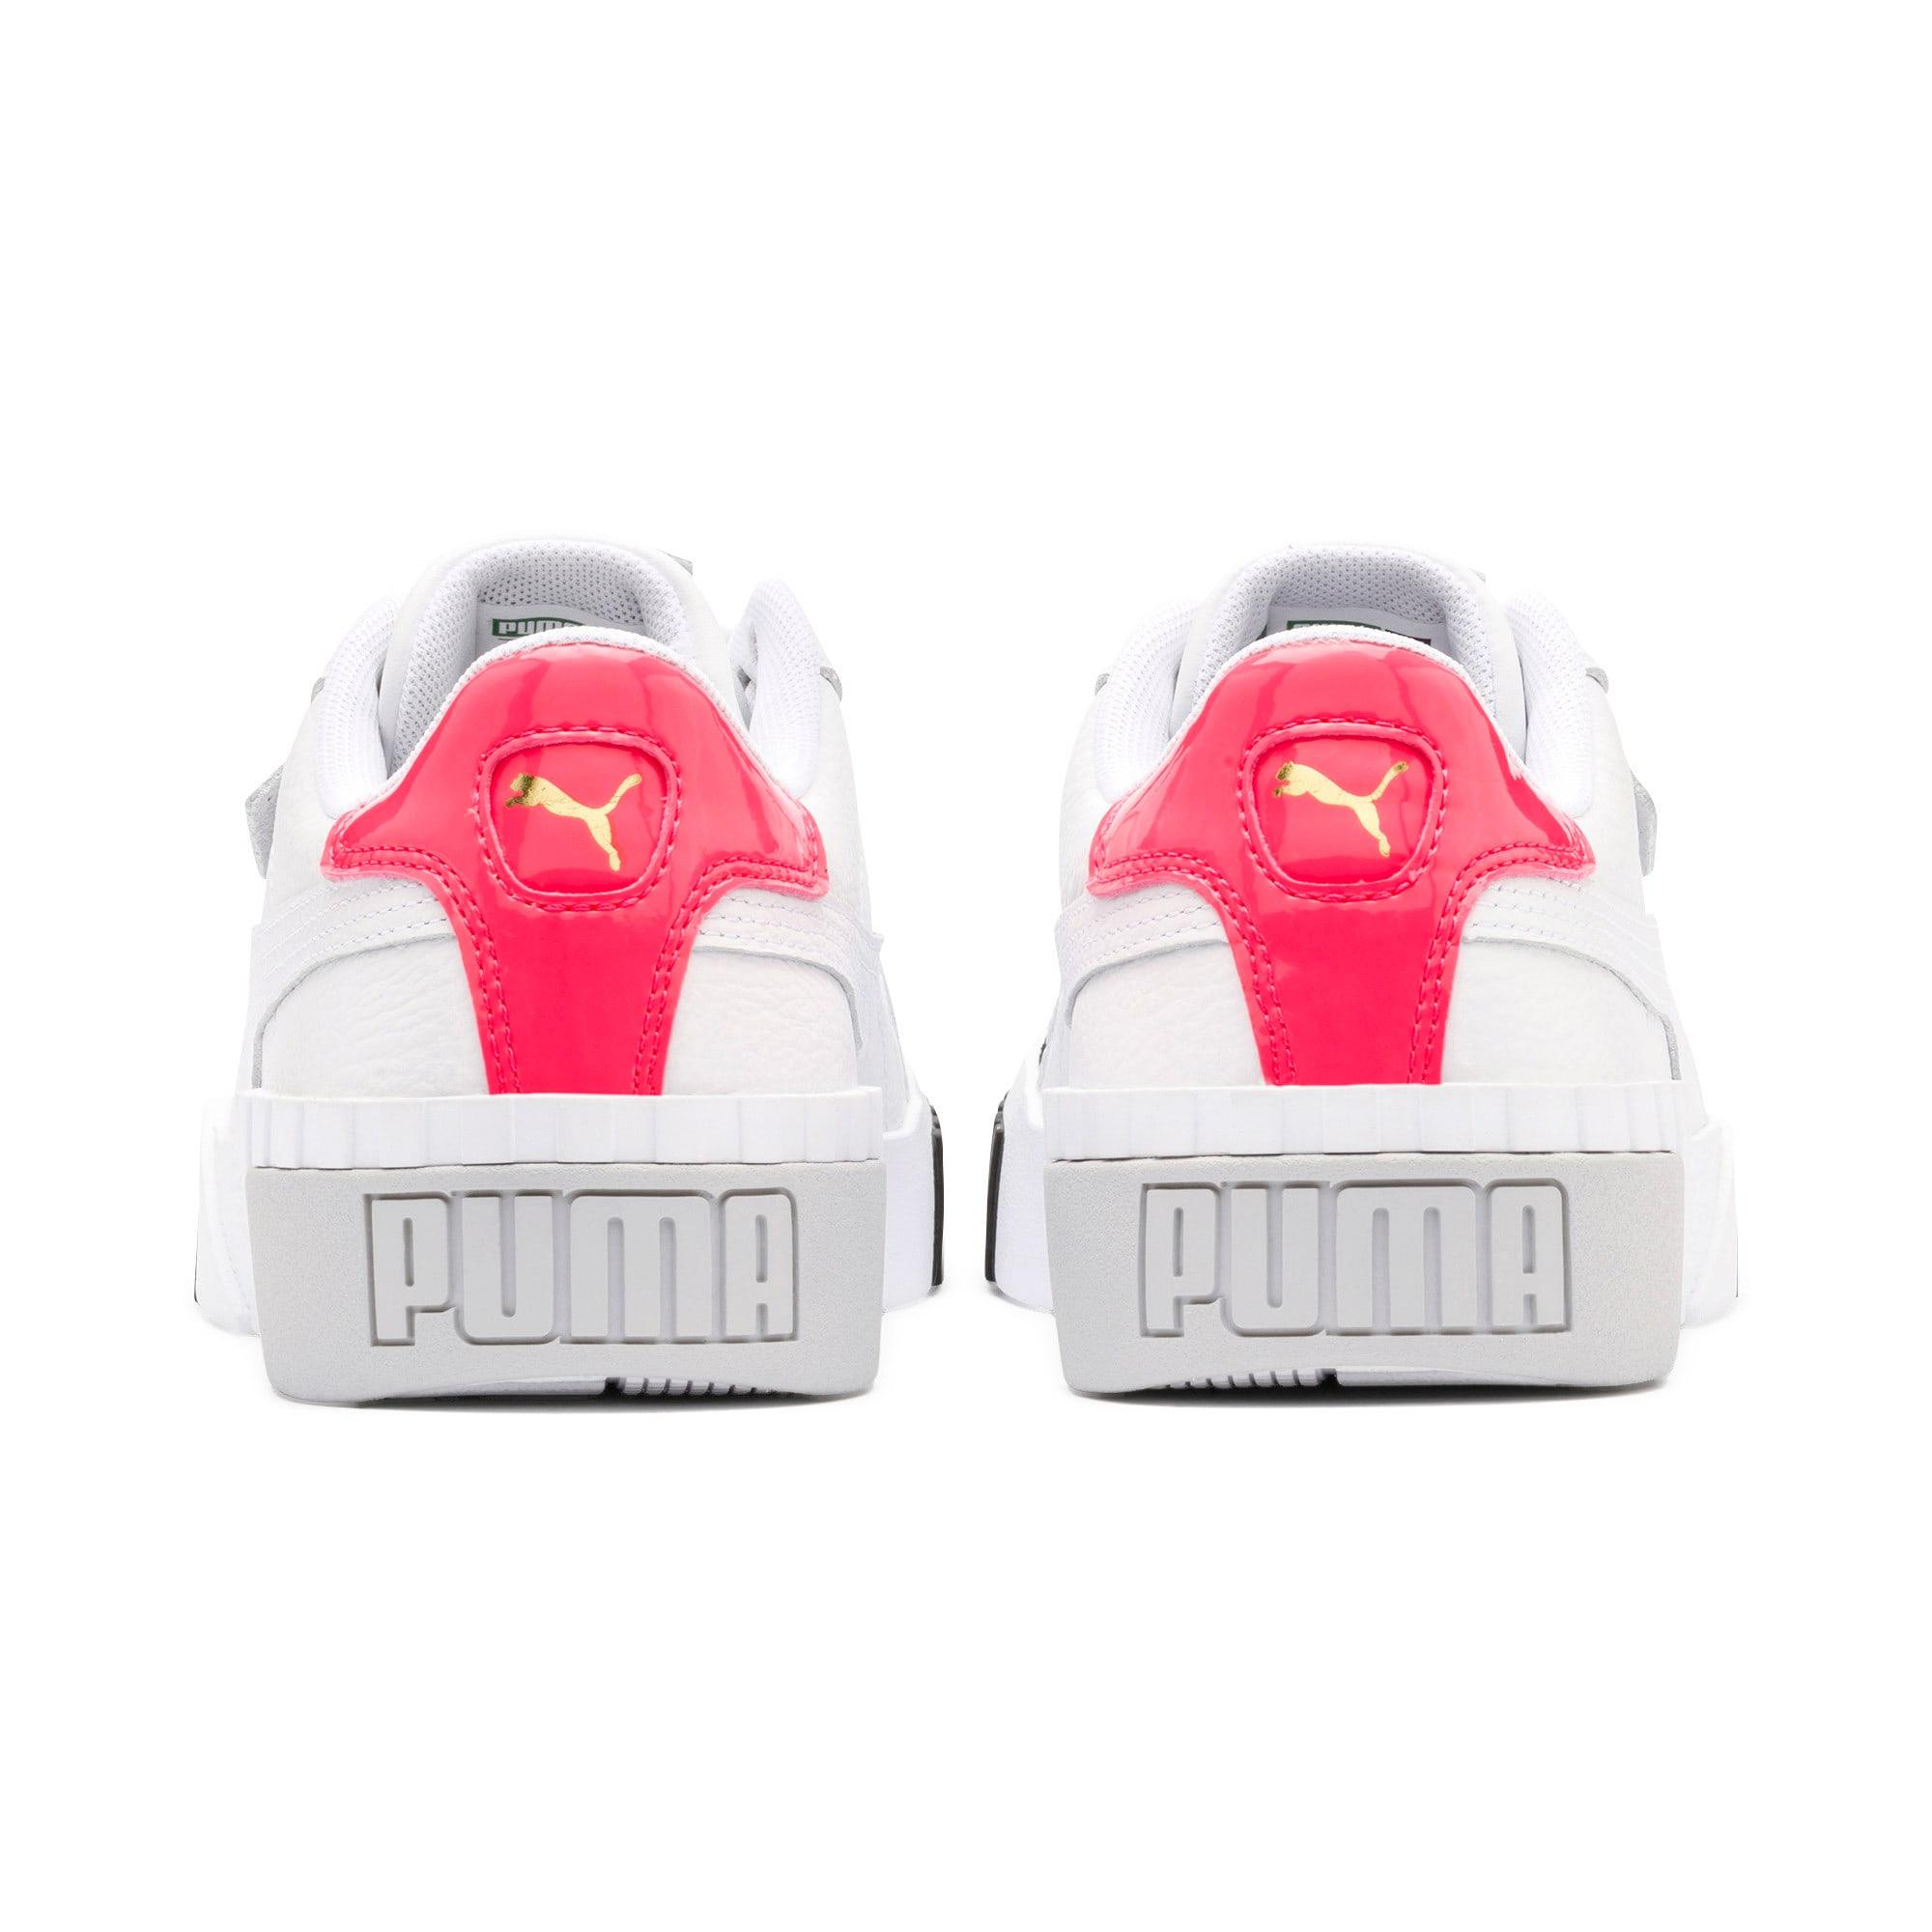 Thumbnail 4 of Damskie buty sportowe Cali Remix, Puma White-Puma Black, medium